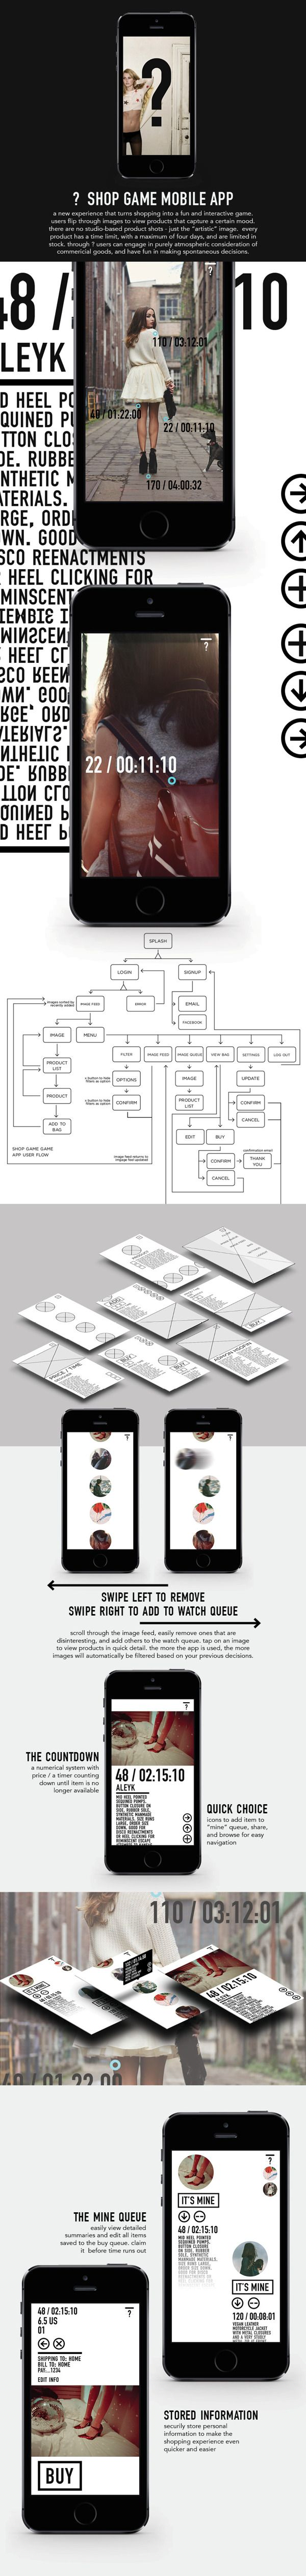 shop game mobile app by Natasha Alia, via Behance